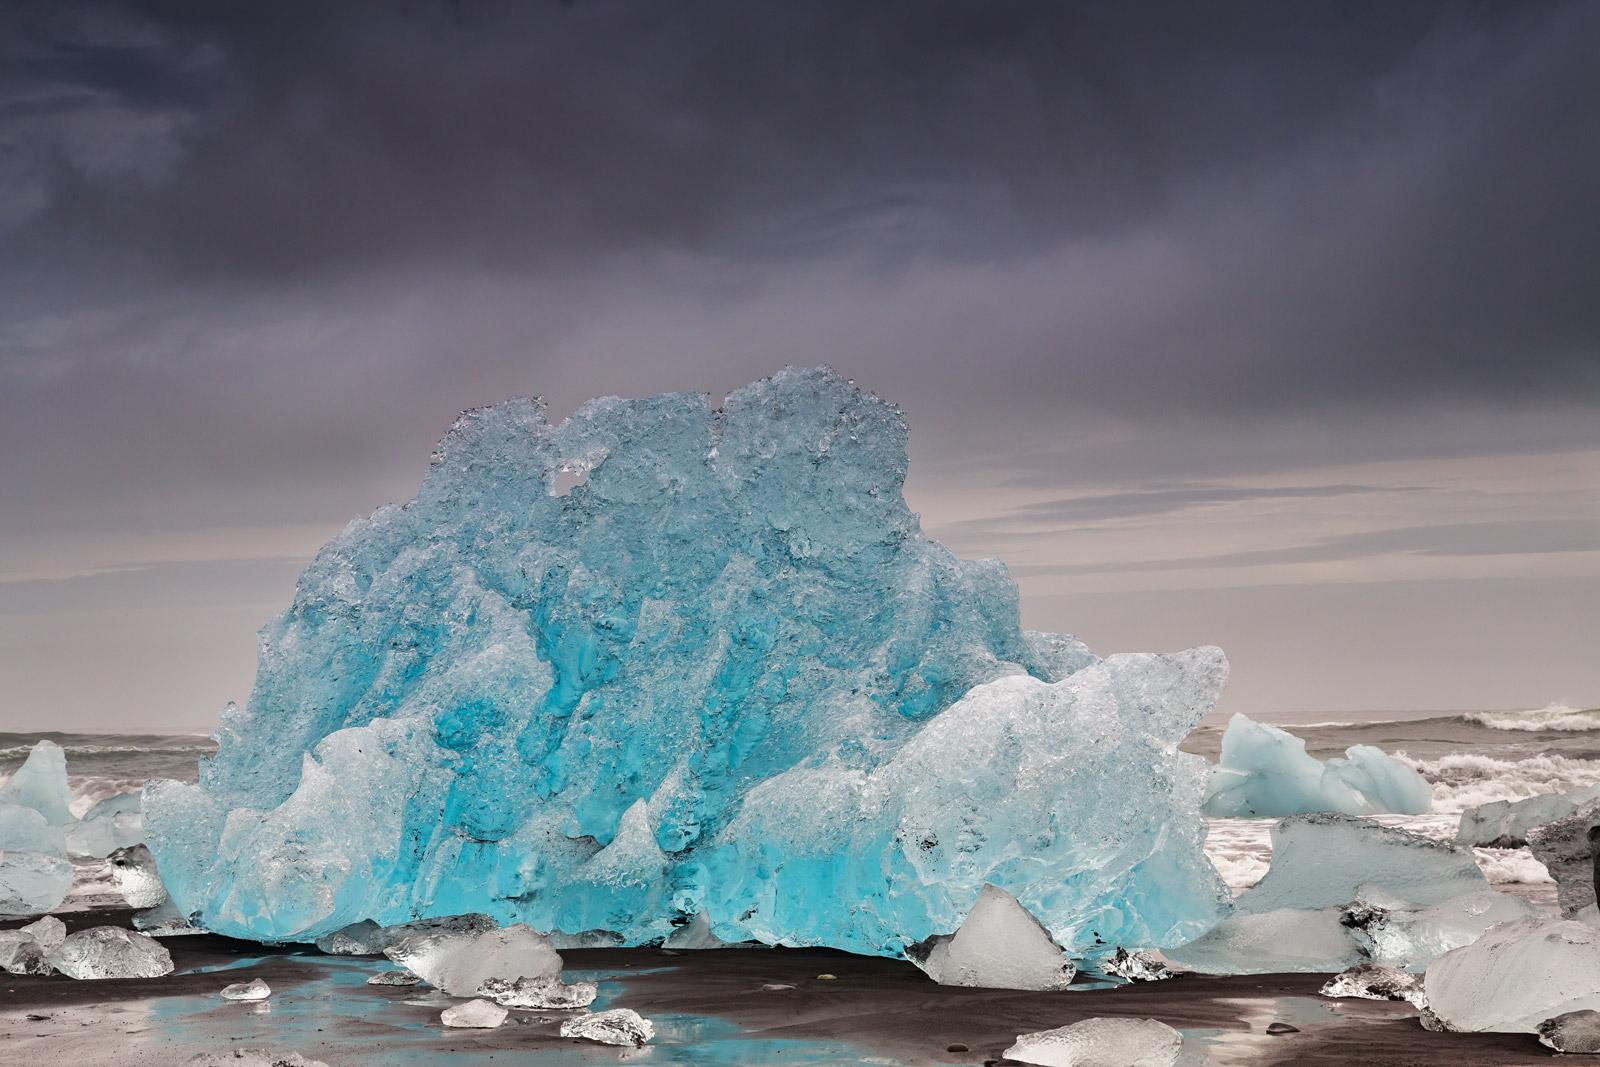 iceland, iceberg, jokulsarlon, lagoon, limited edition, photograph, fine art, landscape, photo